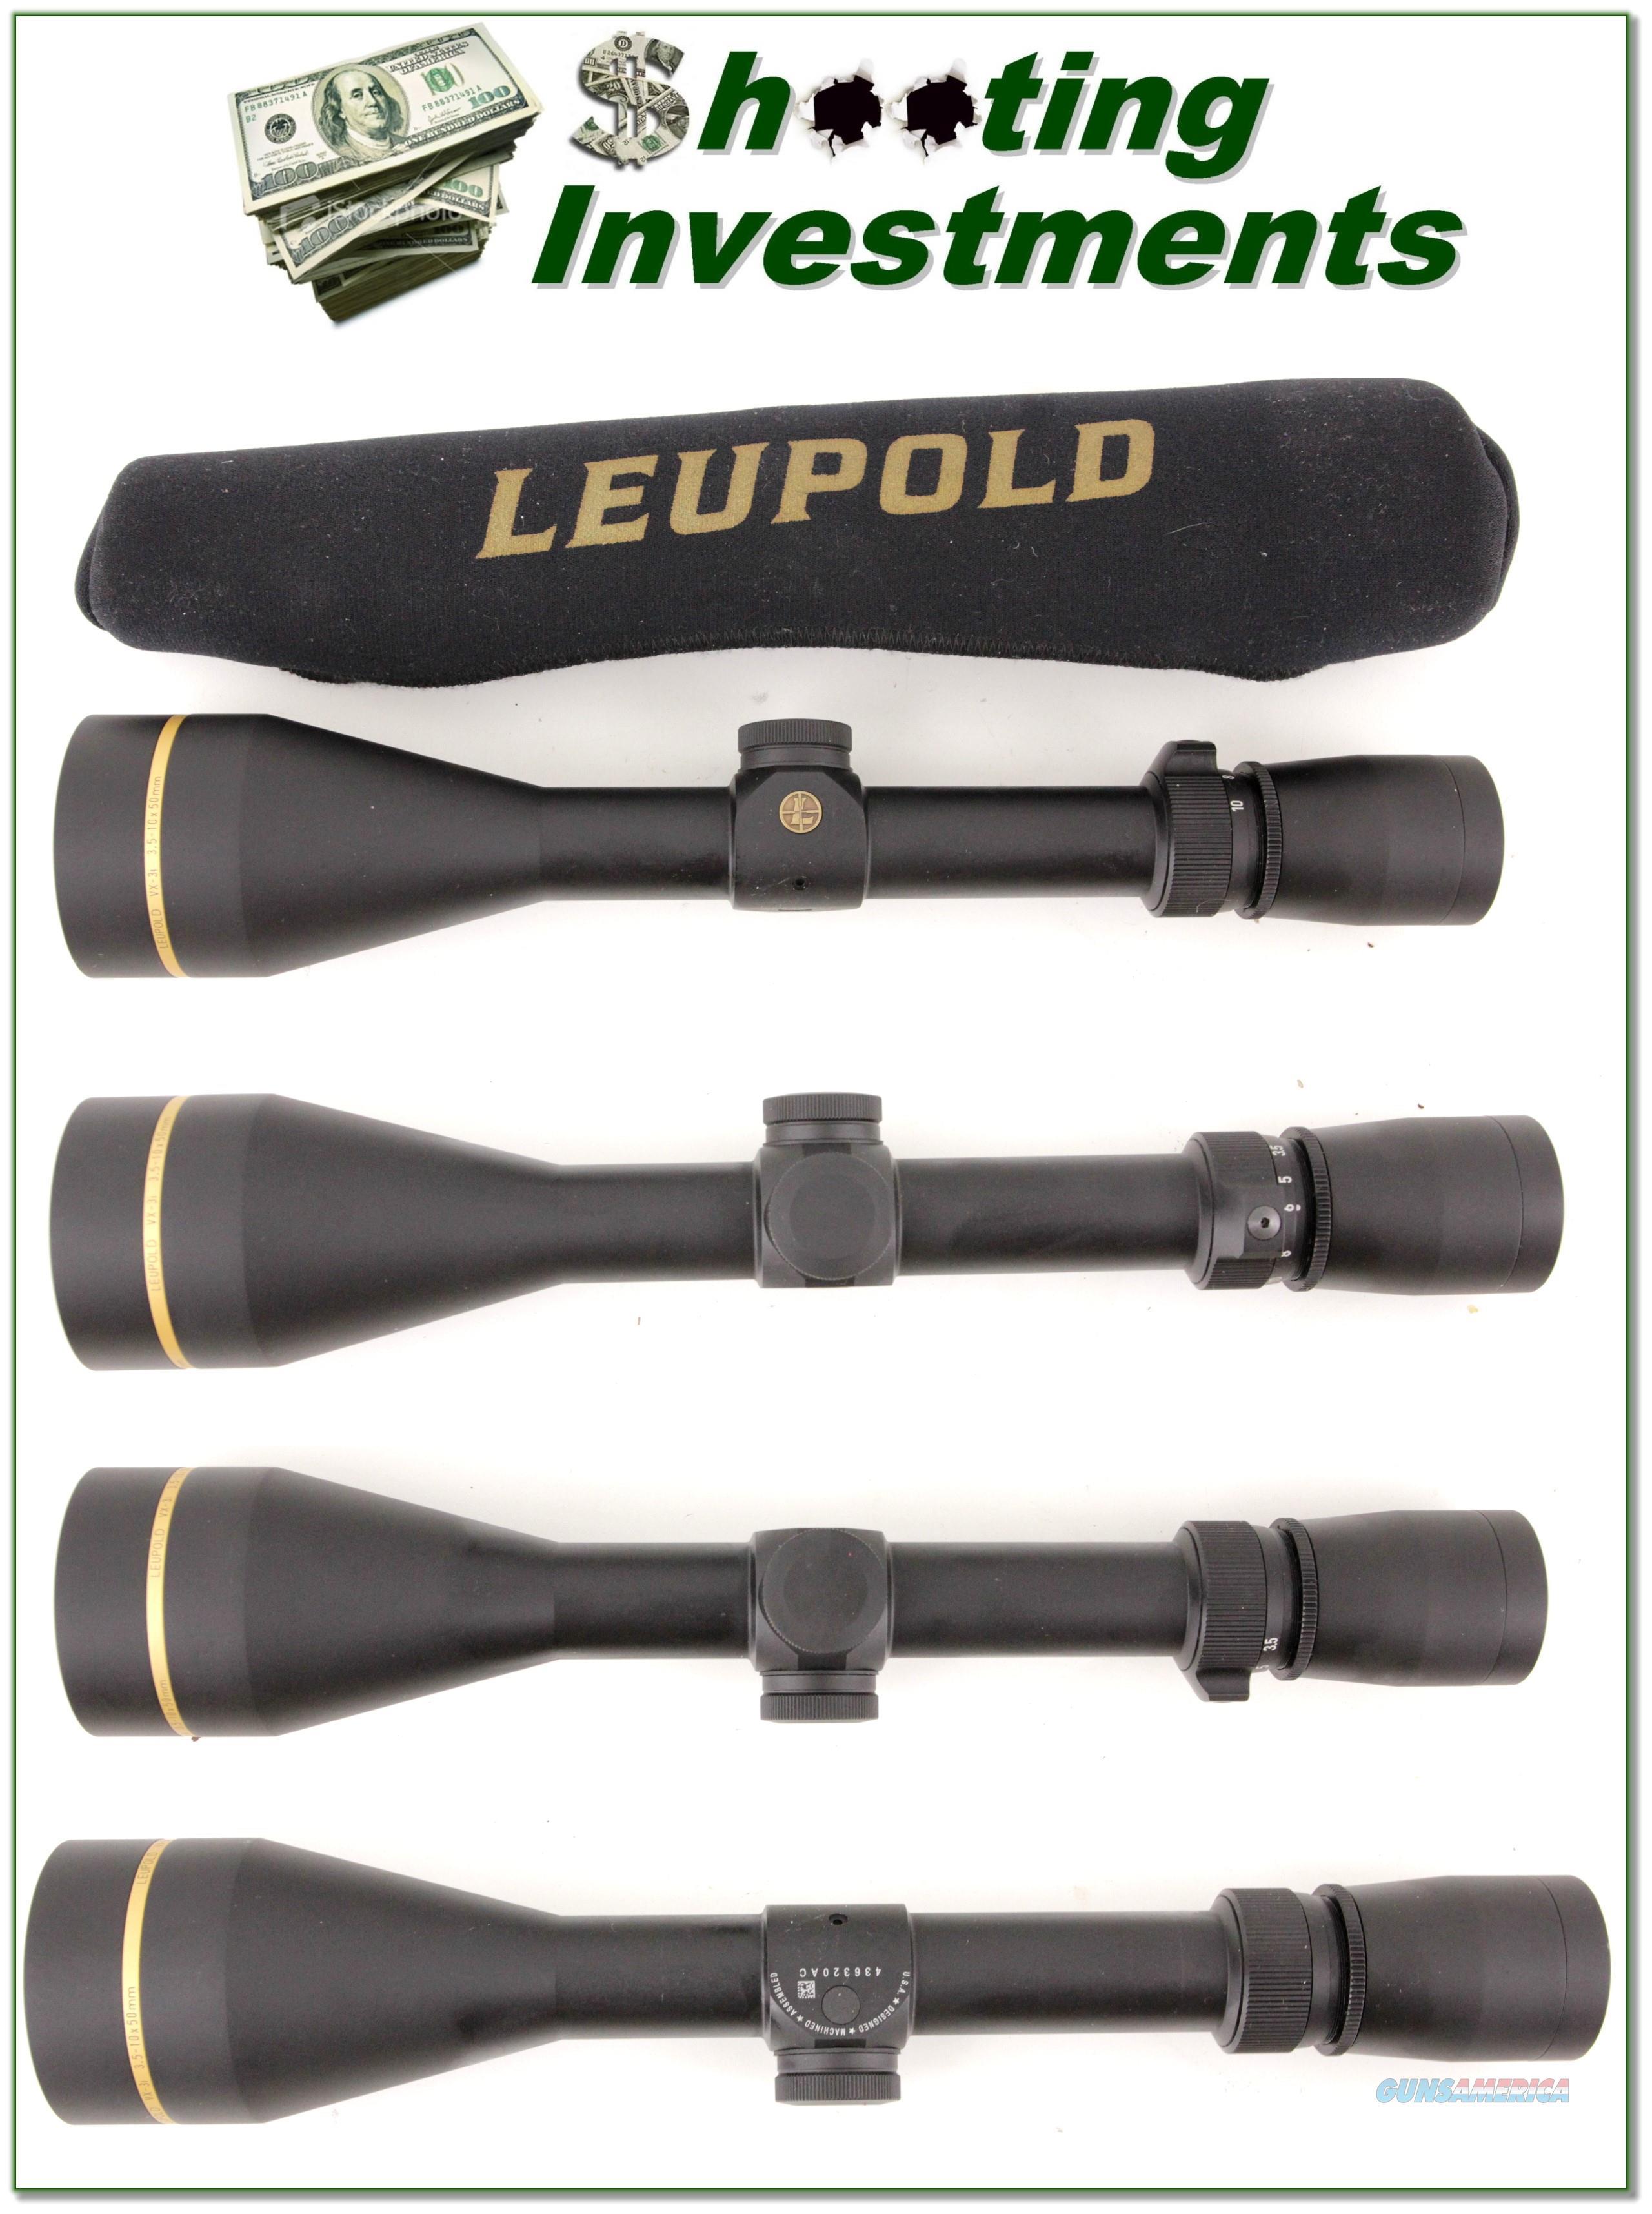 New Condition Leupold VX-3i 3.5-10x50mm Riflescope  Non-Guns > Scopes/Mounts/Rings & Optics > Rifle Scopes > Variable Focal Length